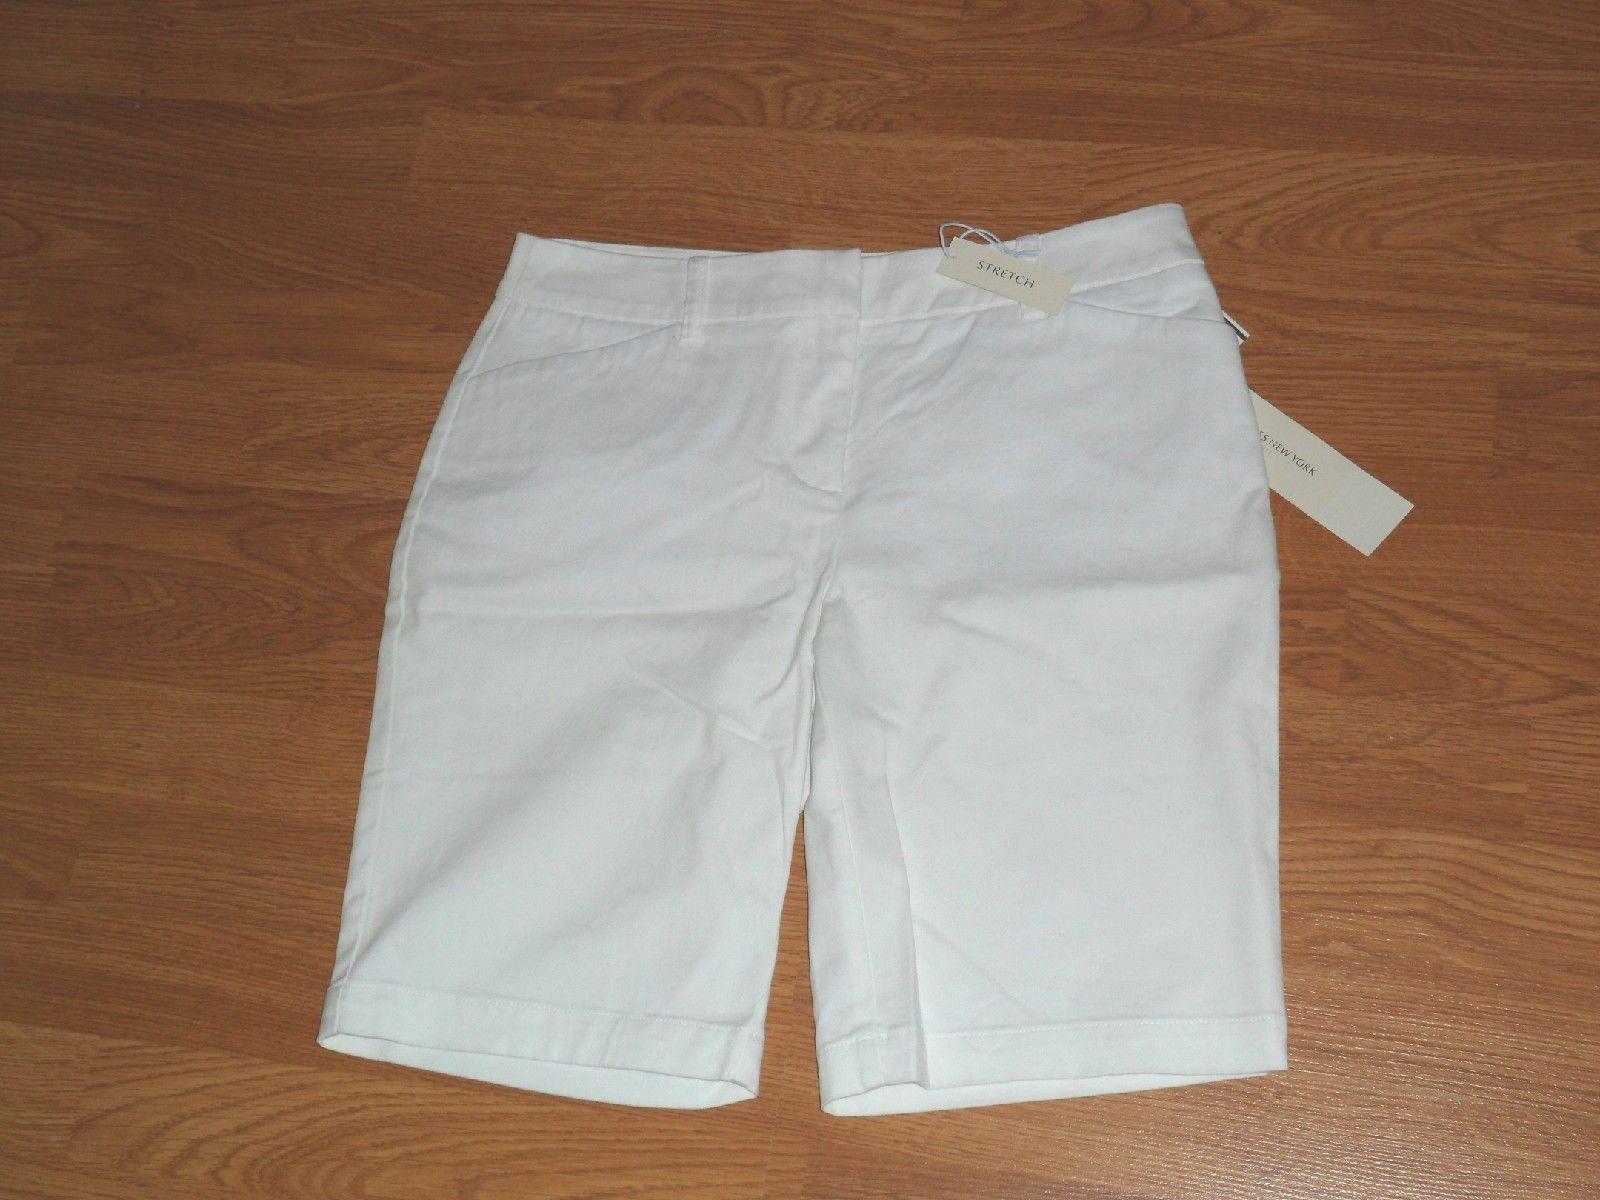 *JONES NEW YORK SPORT BERMUDA SHORTS SIZE 6-8-8P WHITE STRETCH MSRP:$44.00 NWT